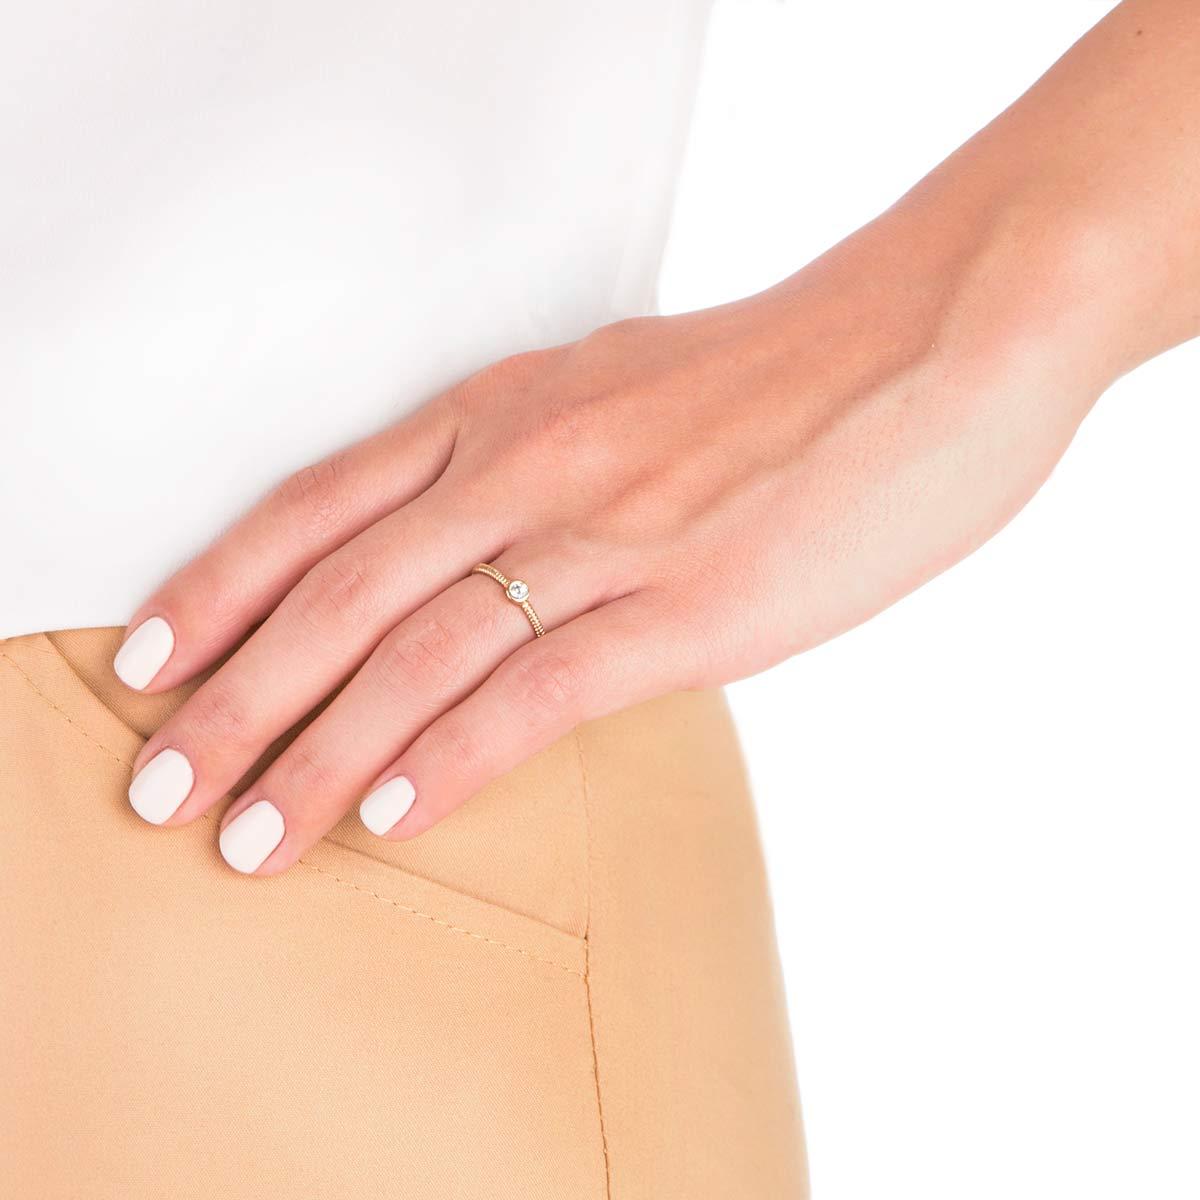 انگشتر طلا تک نگین سفید لونا پیچ